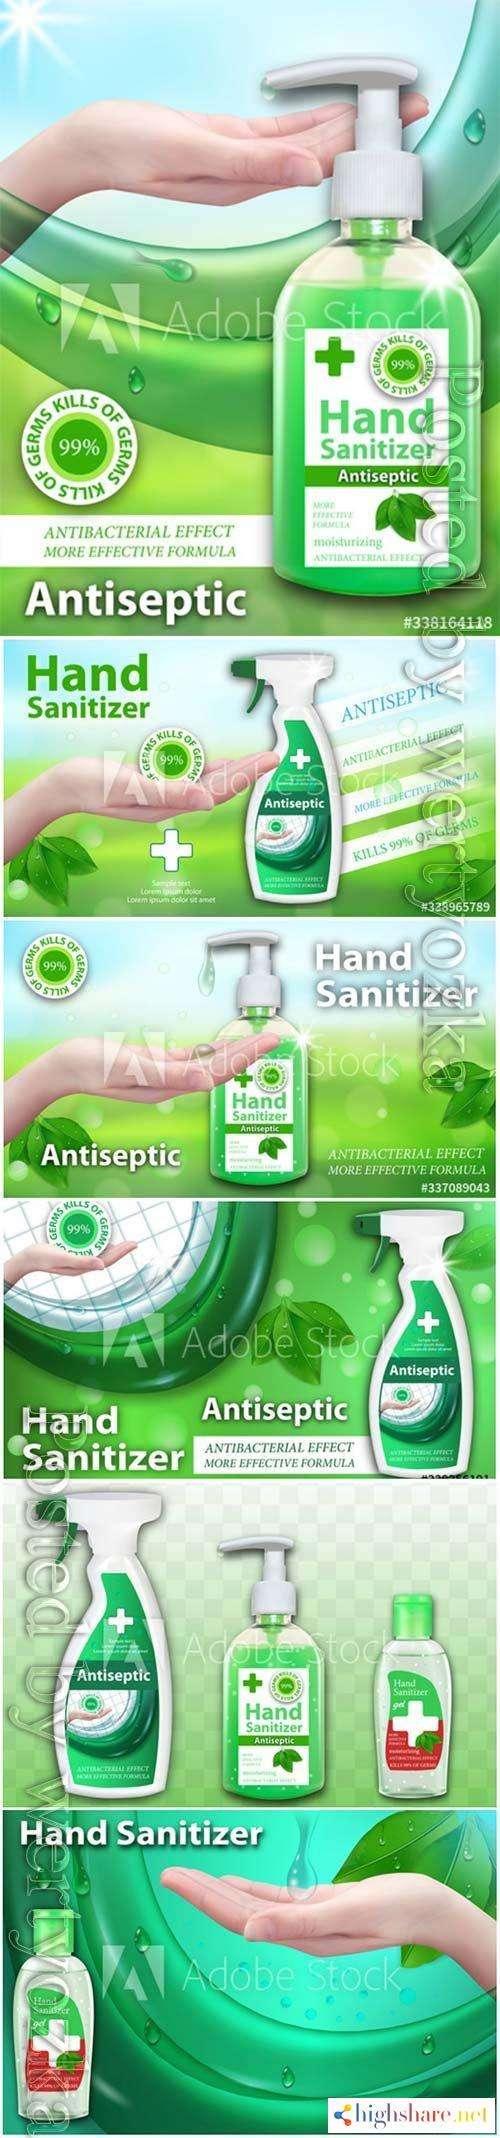 antiseptic for hands in bottles vector design 5f41d73234c4d - Antiseptic for hands in bottles vector design